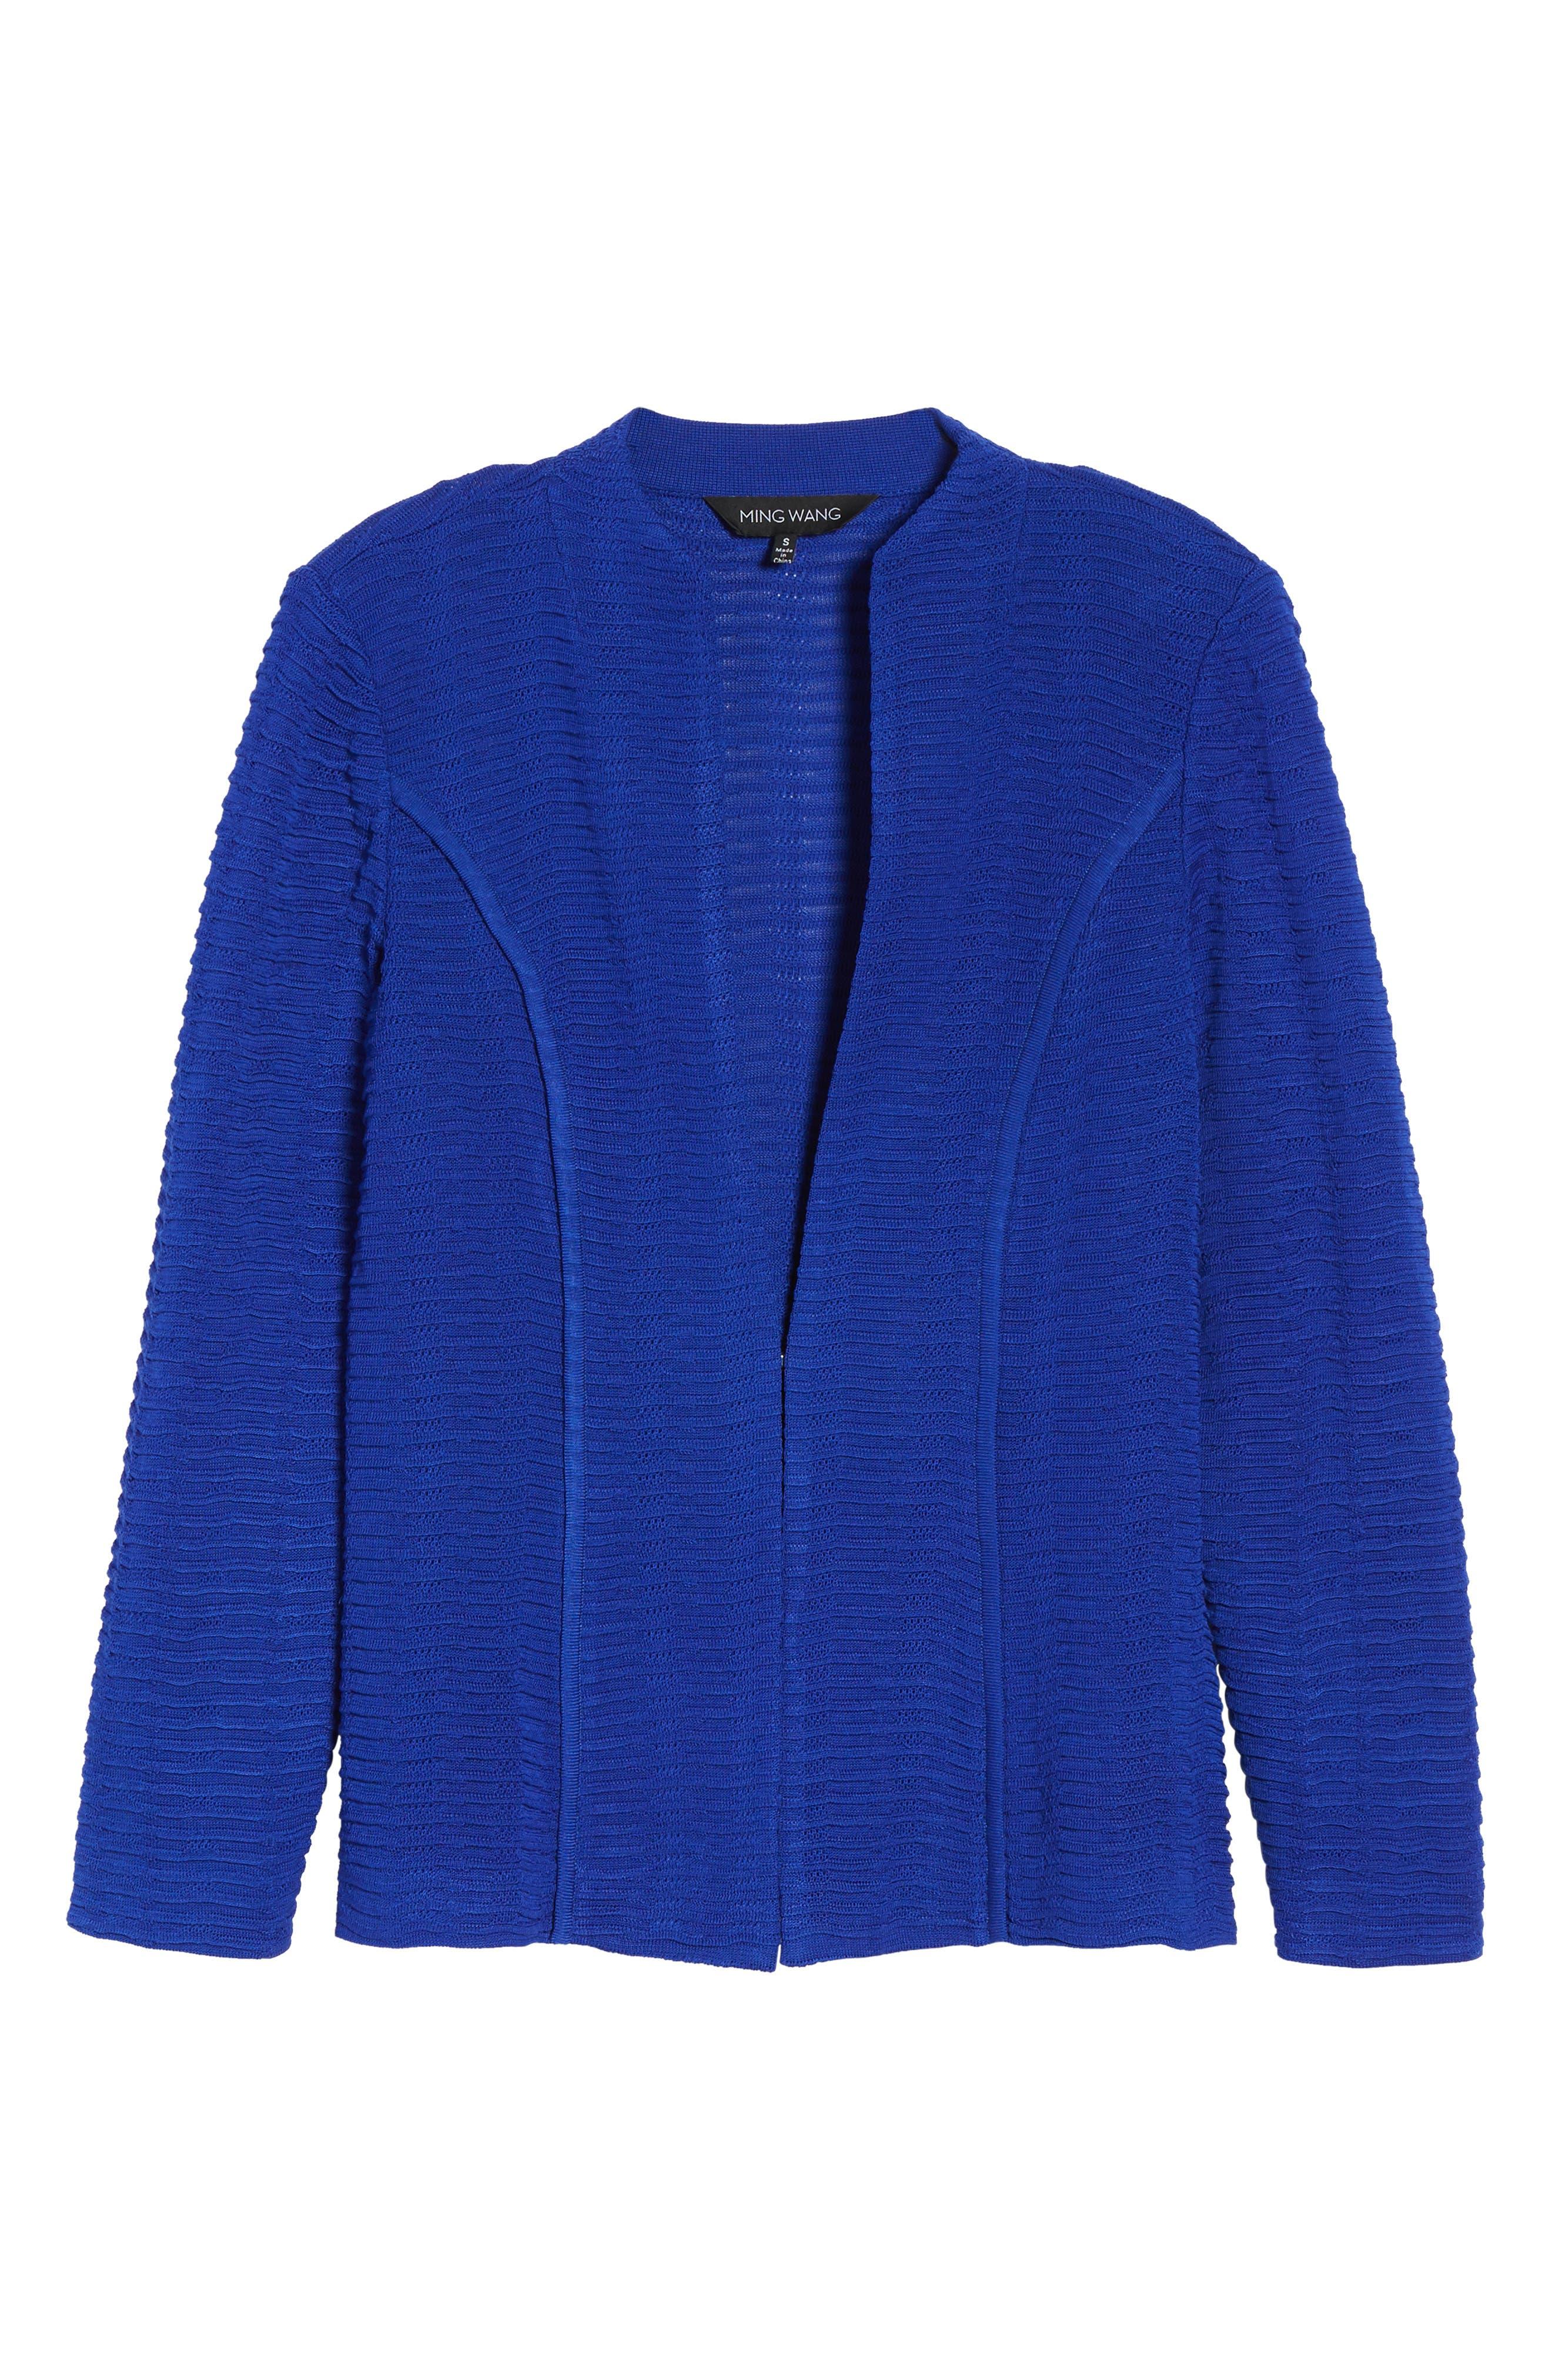 Ripple Knit Jacket,                             Alternate thumbnail 5, color,